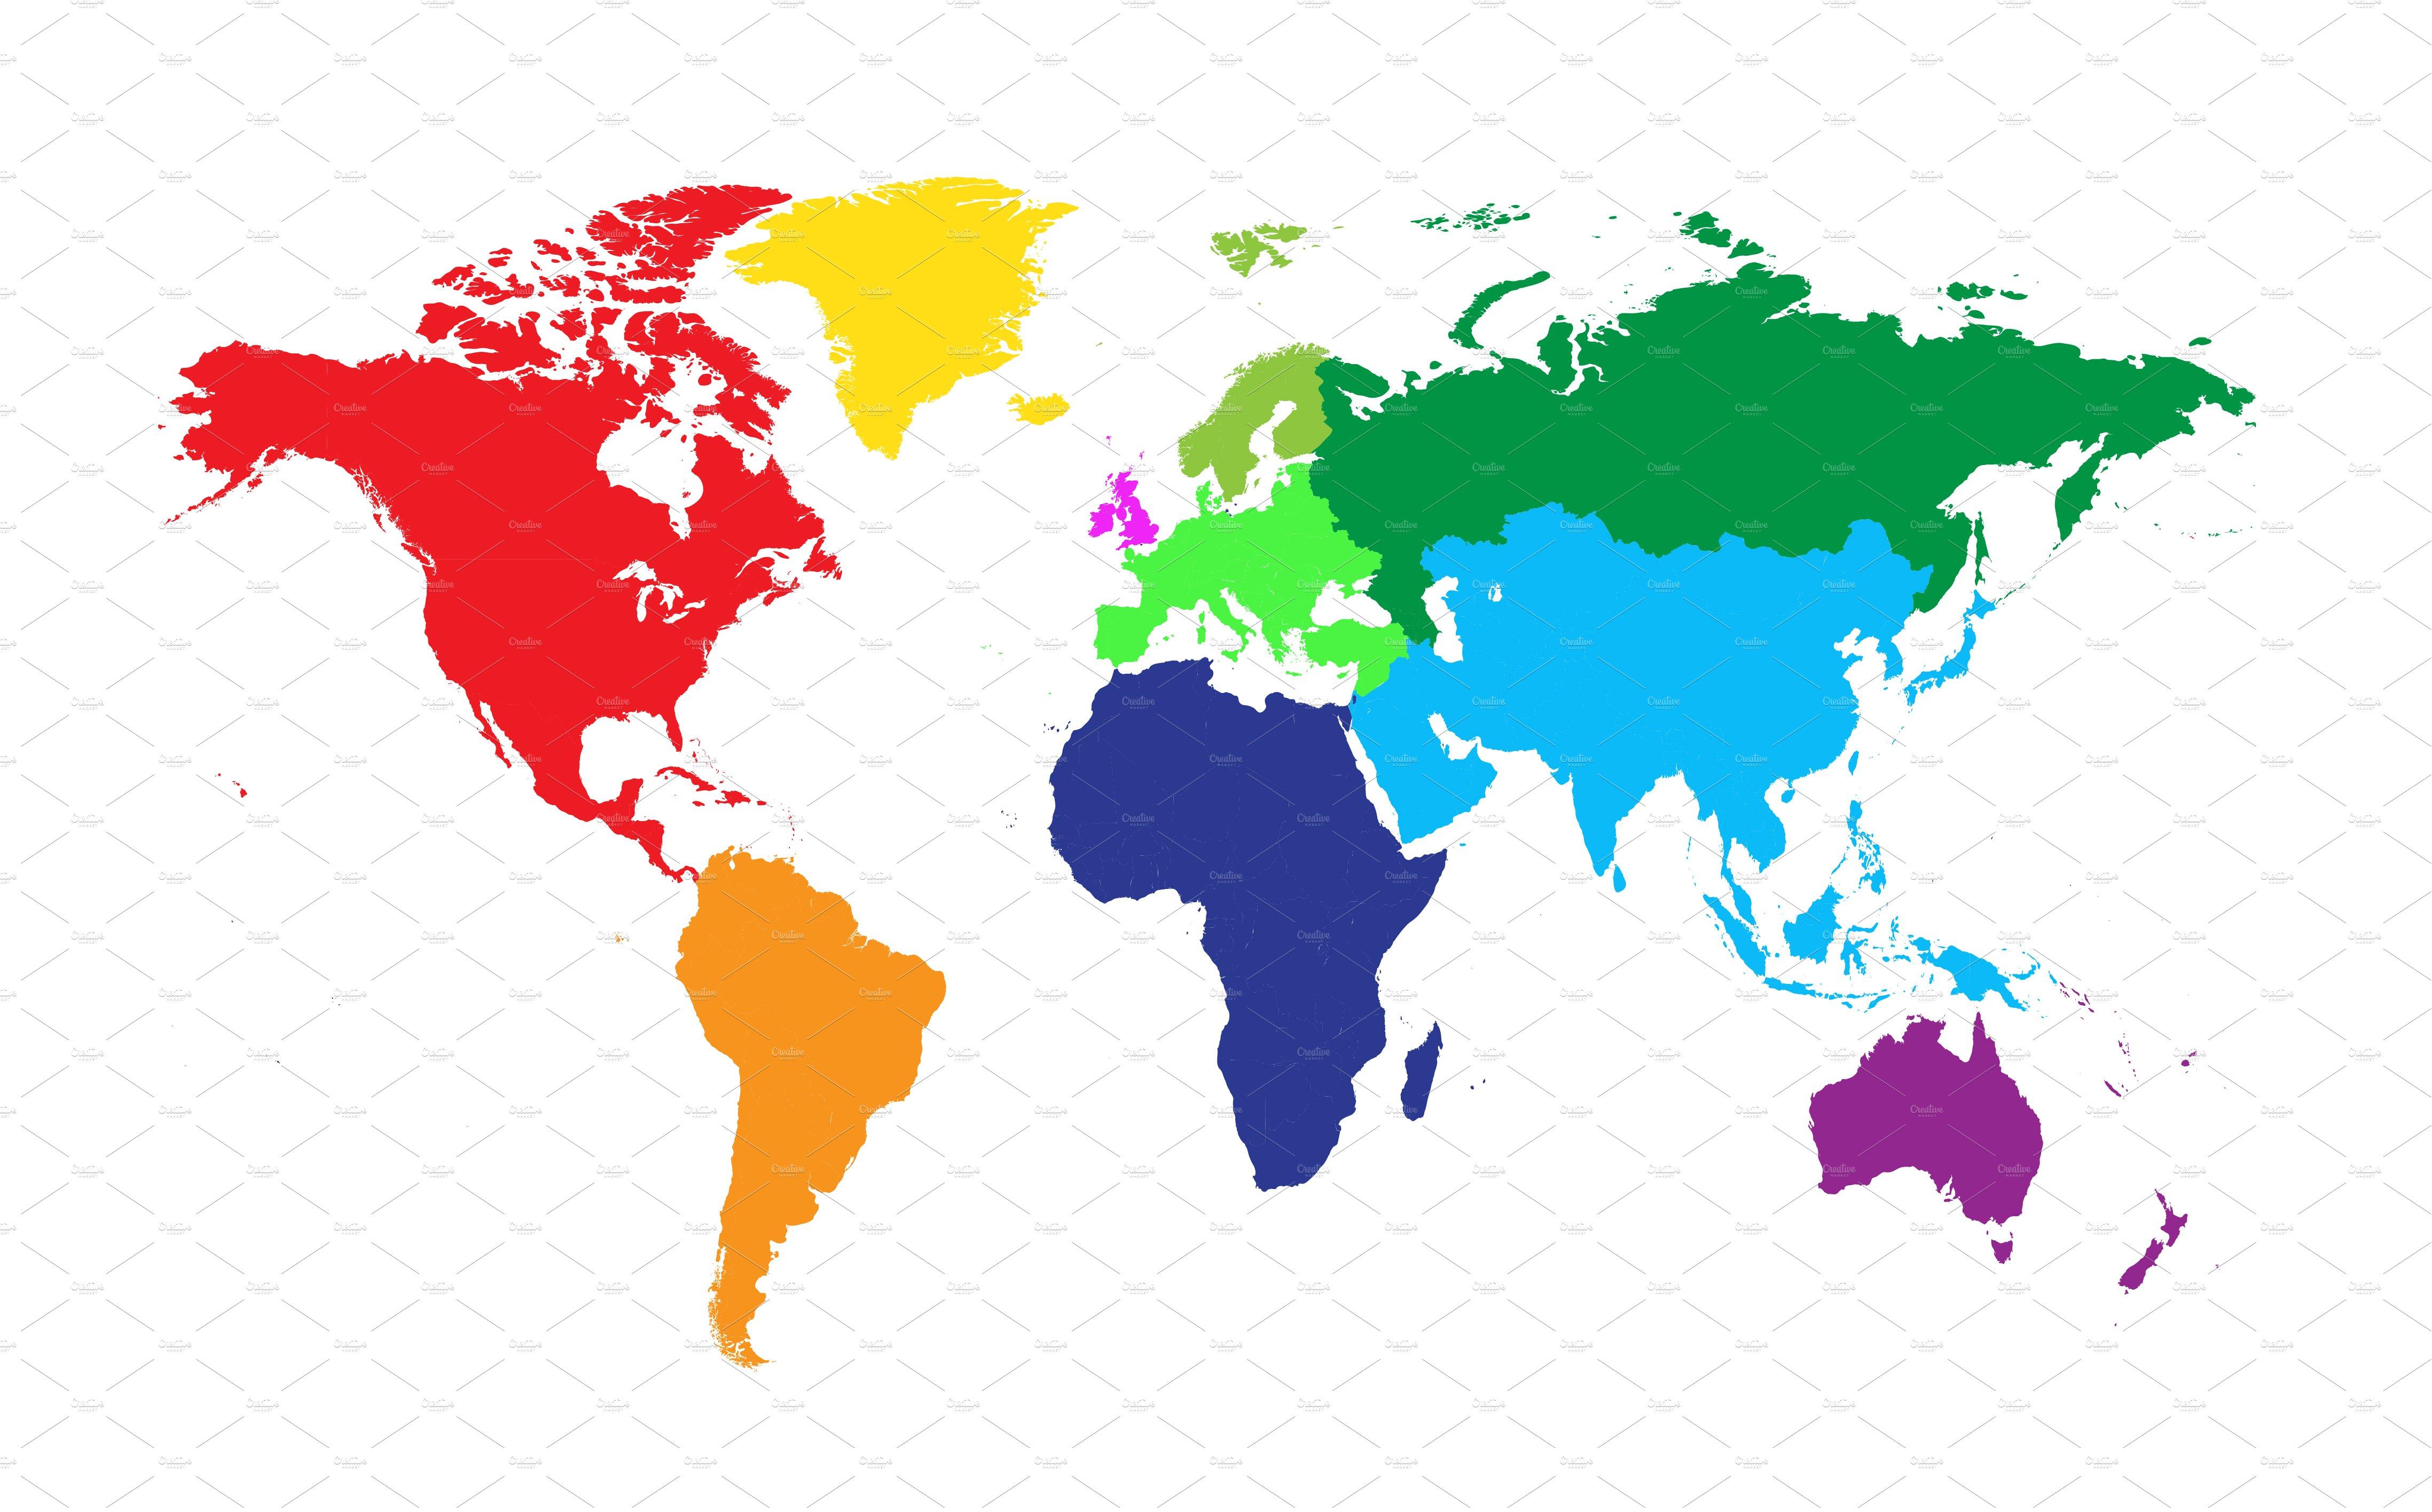 World map colored ~ Web Elements ~ Creative Market